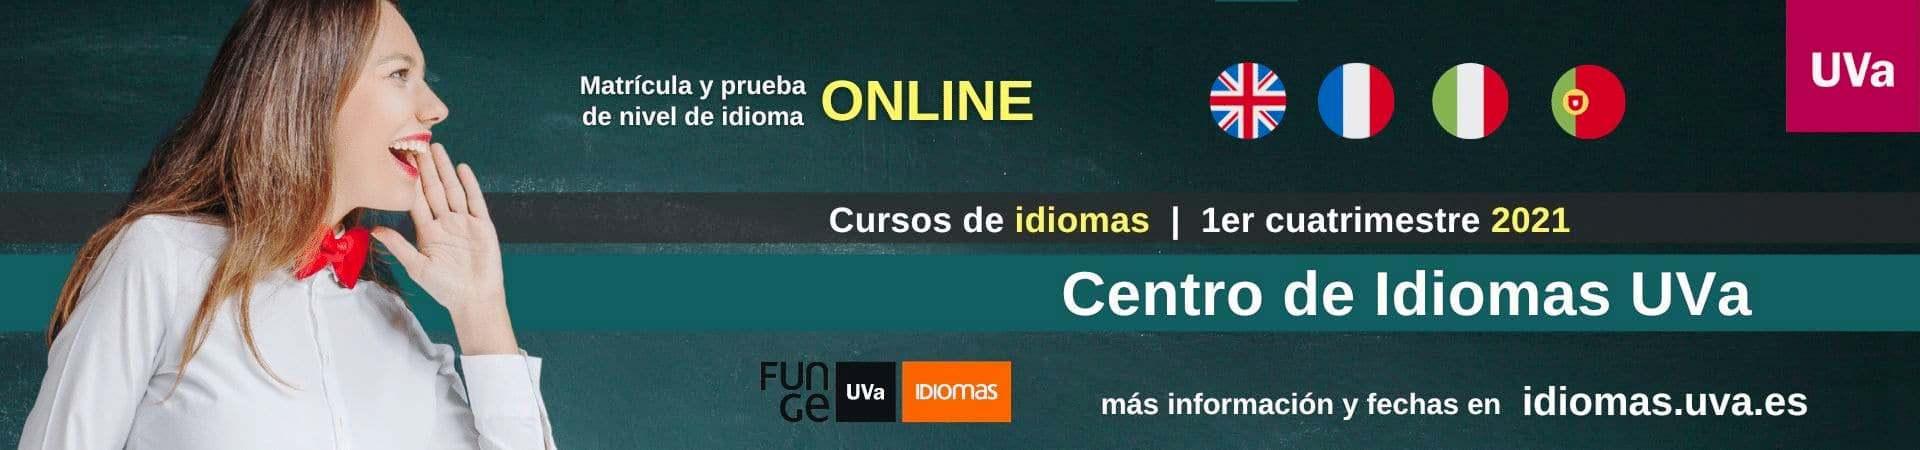 Banner cursos de idiomas UVa 1er cuatrimestre 2021